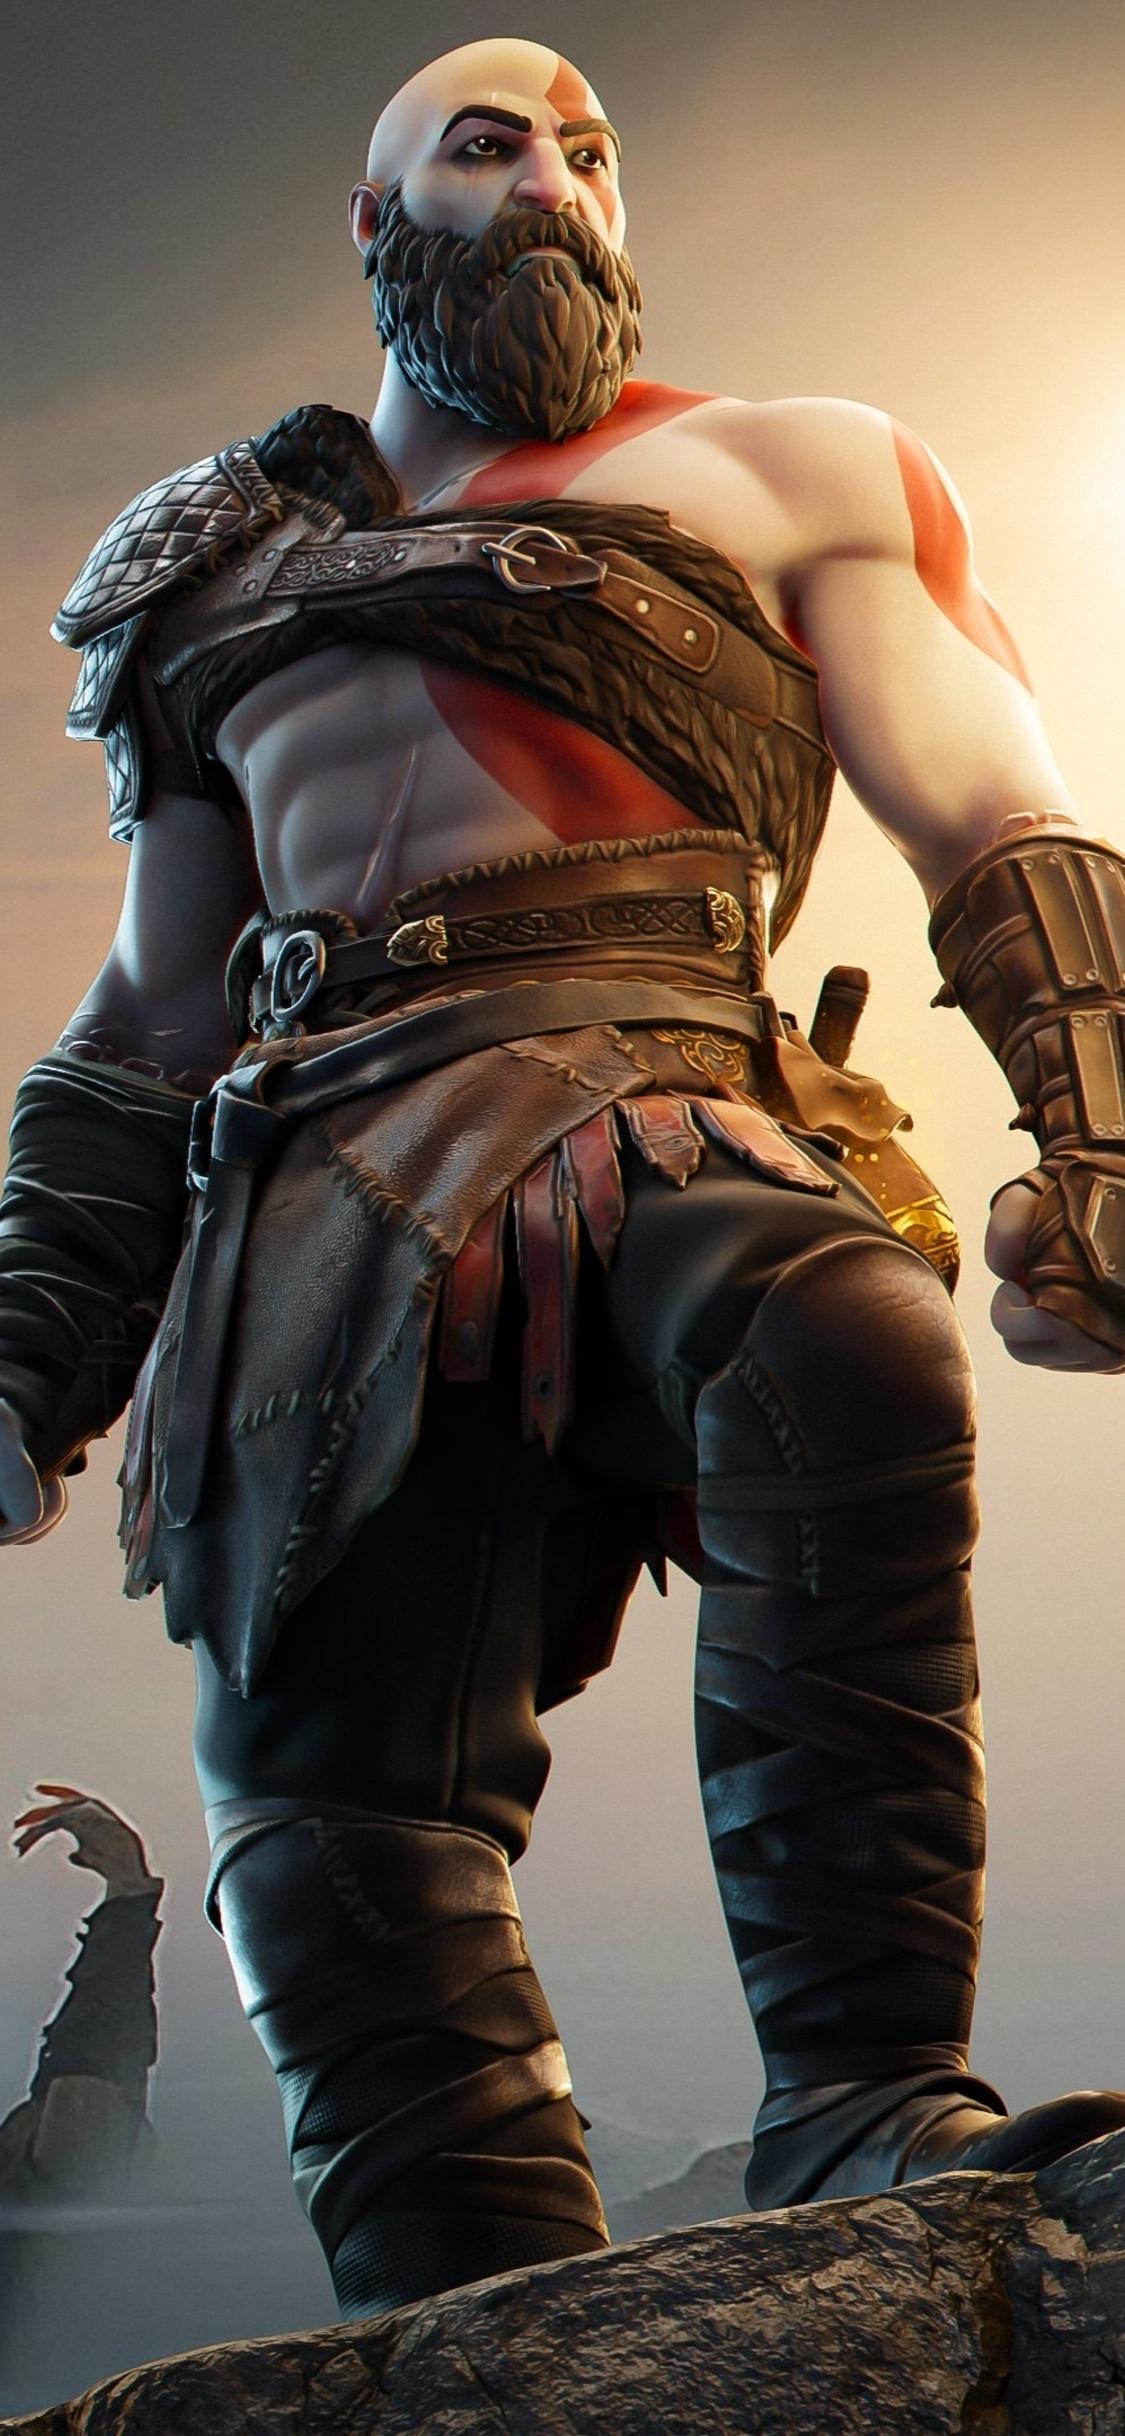 god-of-war-kratos-in-fortnite-2021-2k.jpg